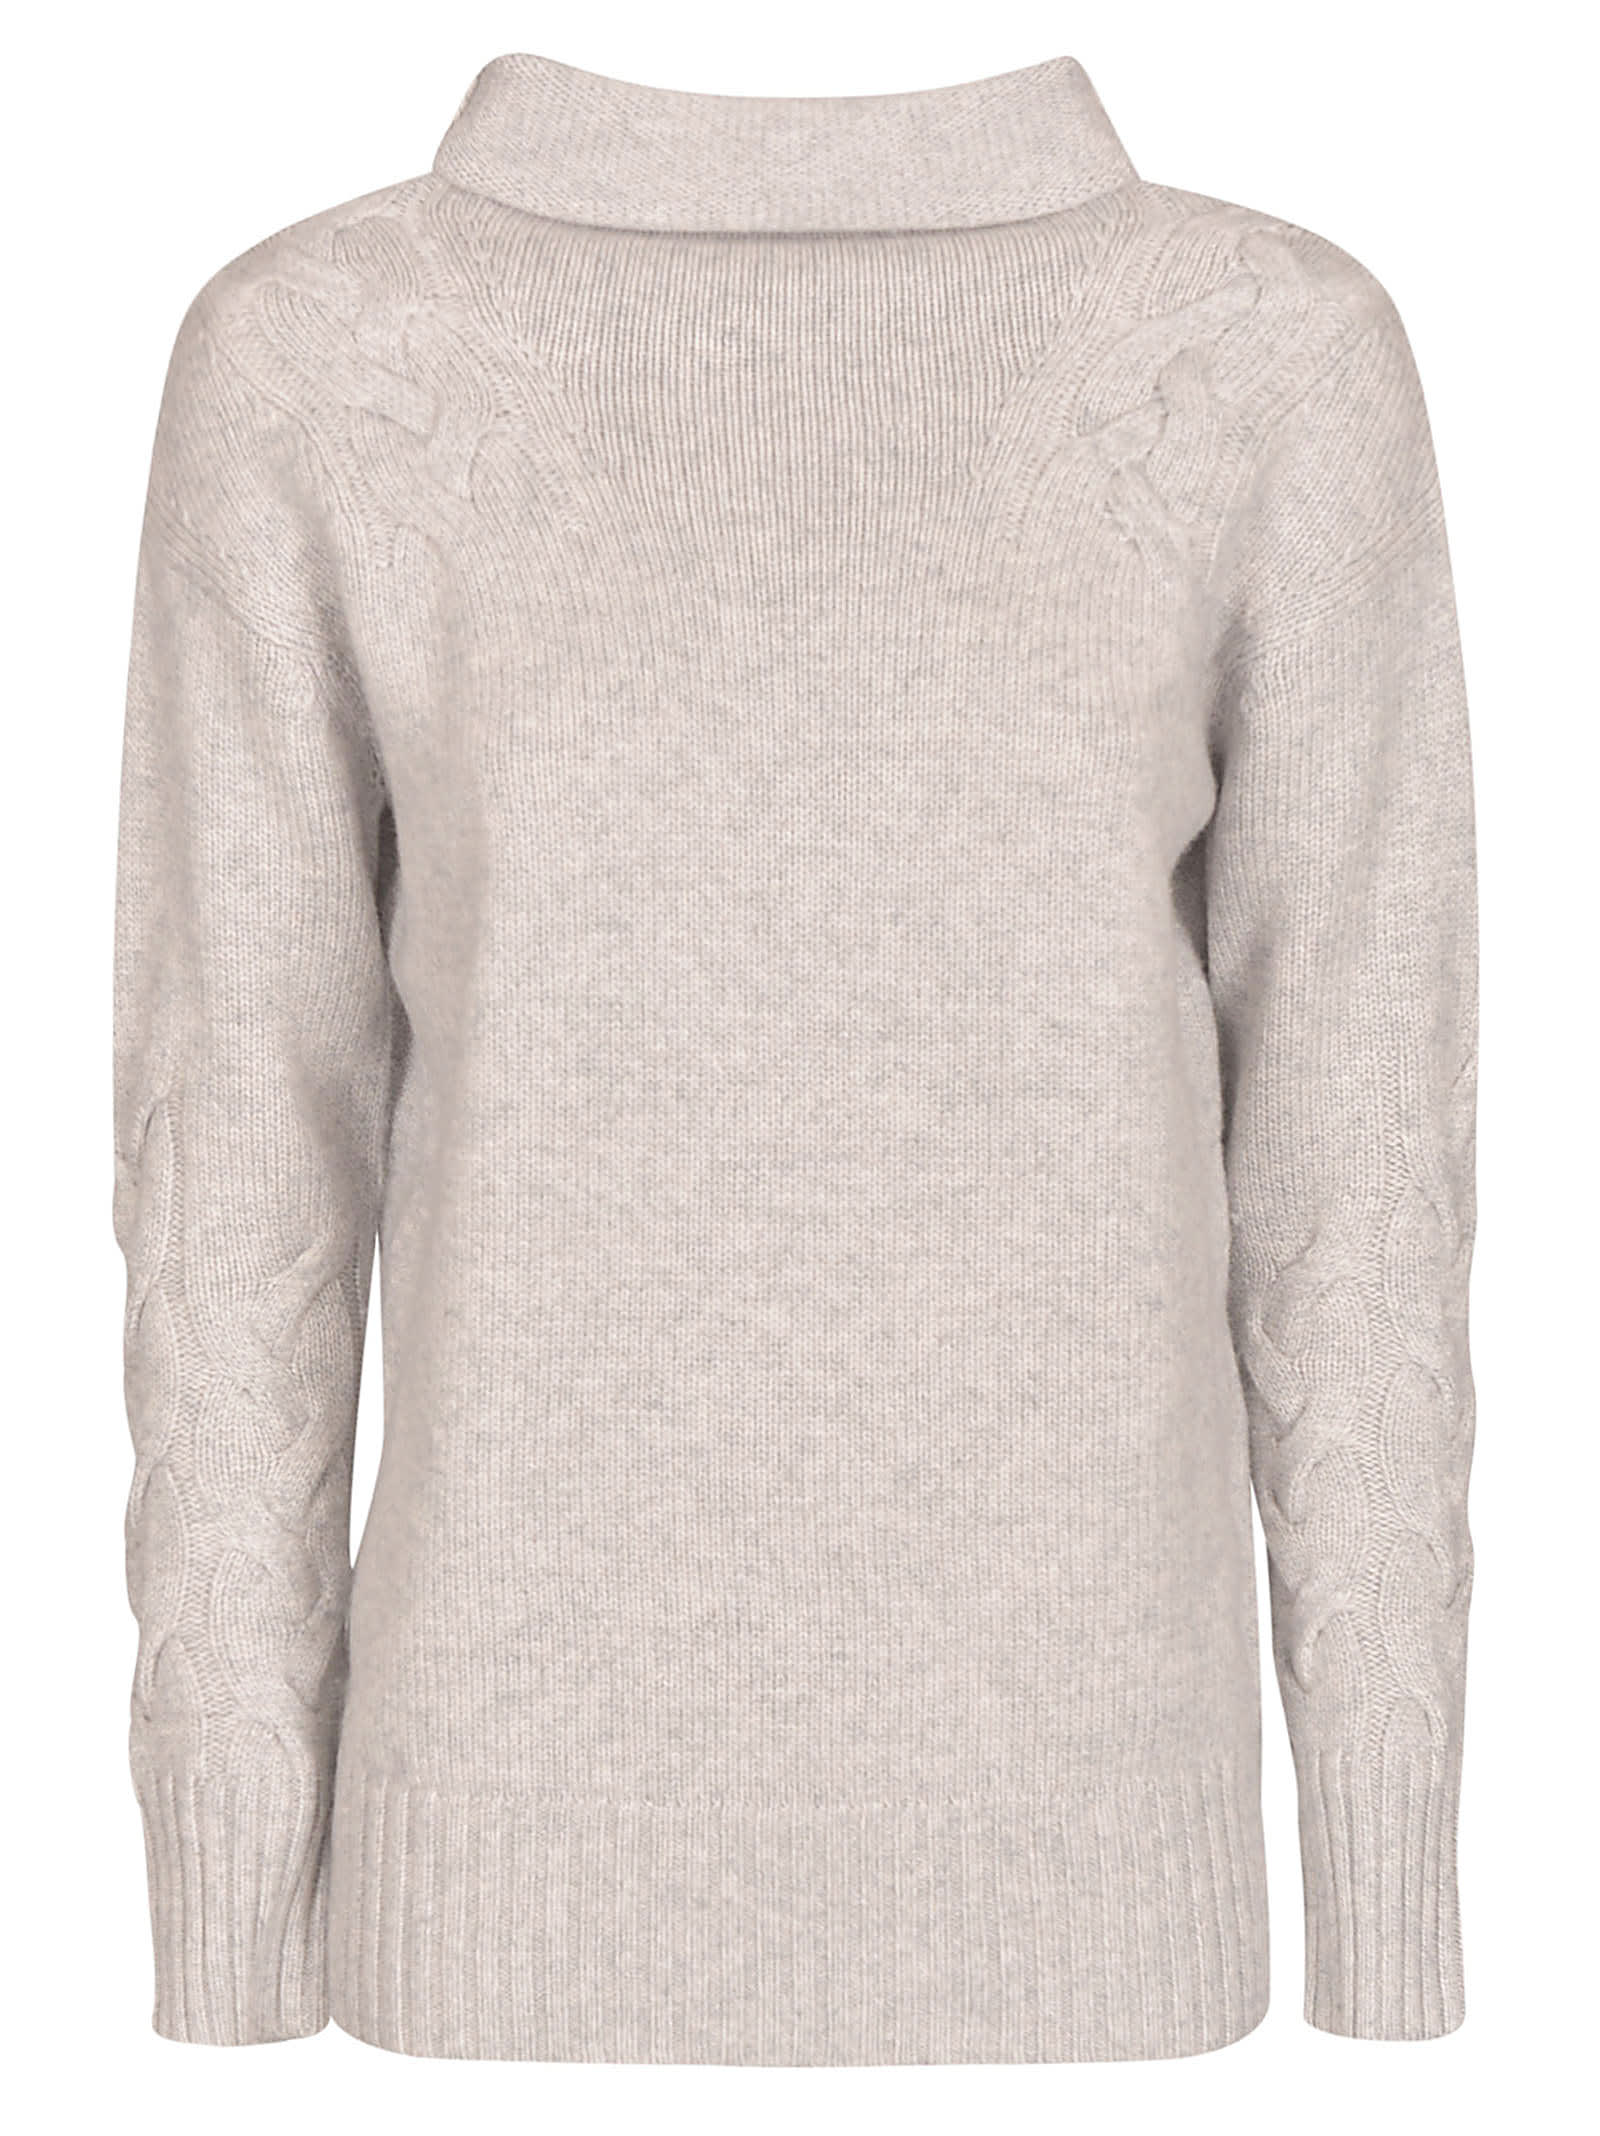 Urssuri Sweater